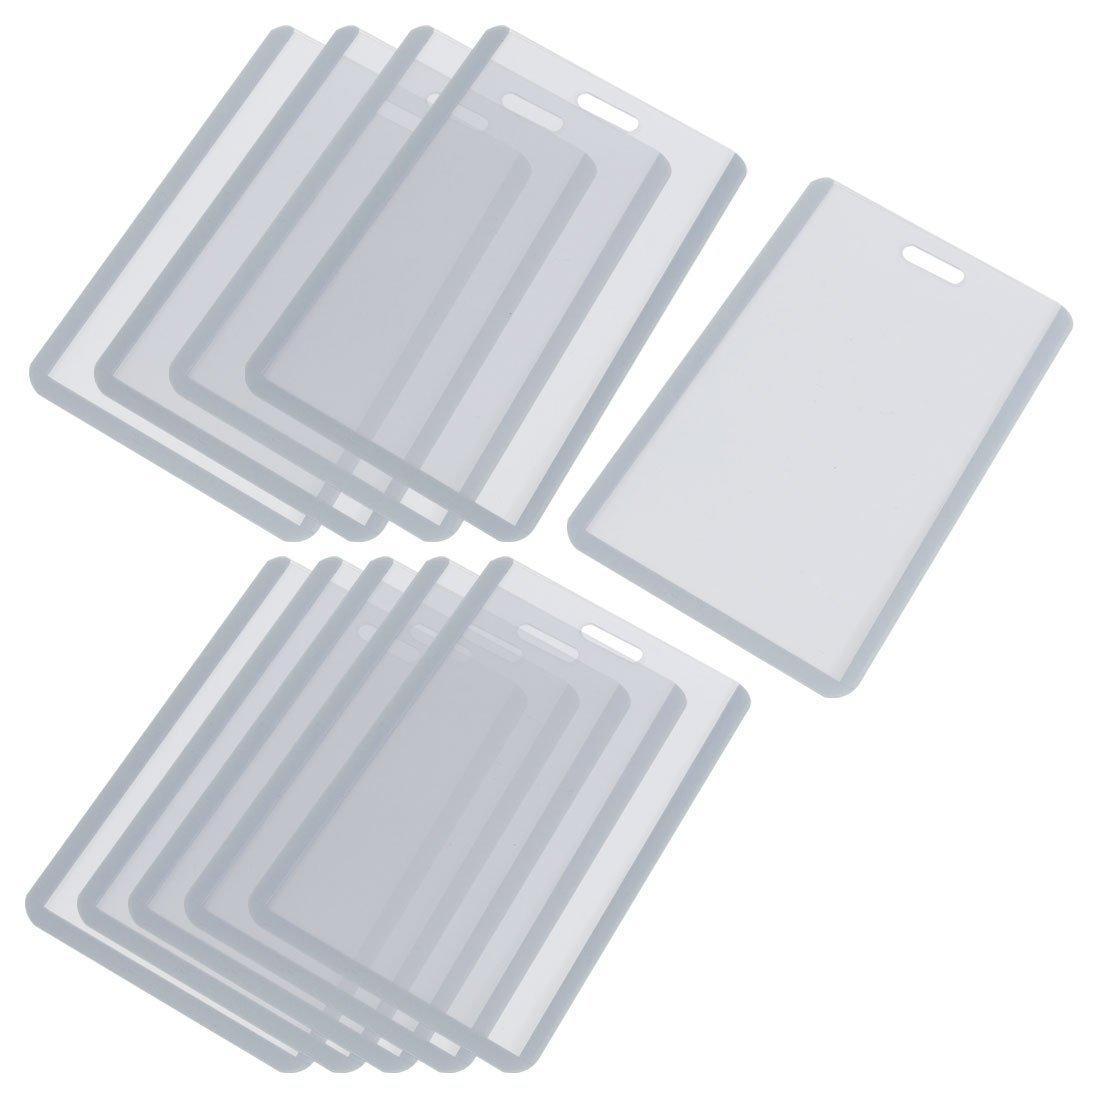 grigio trasparente R TOOGOO 10 pezzi Supporto verticale ID Badge Card